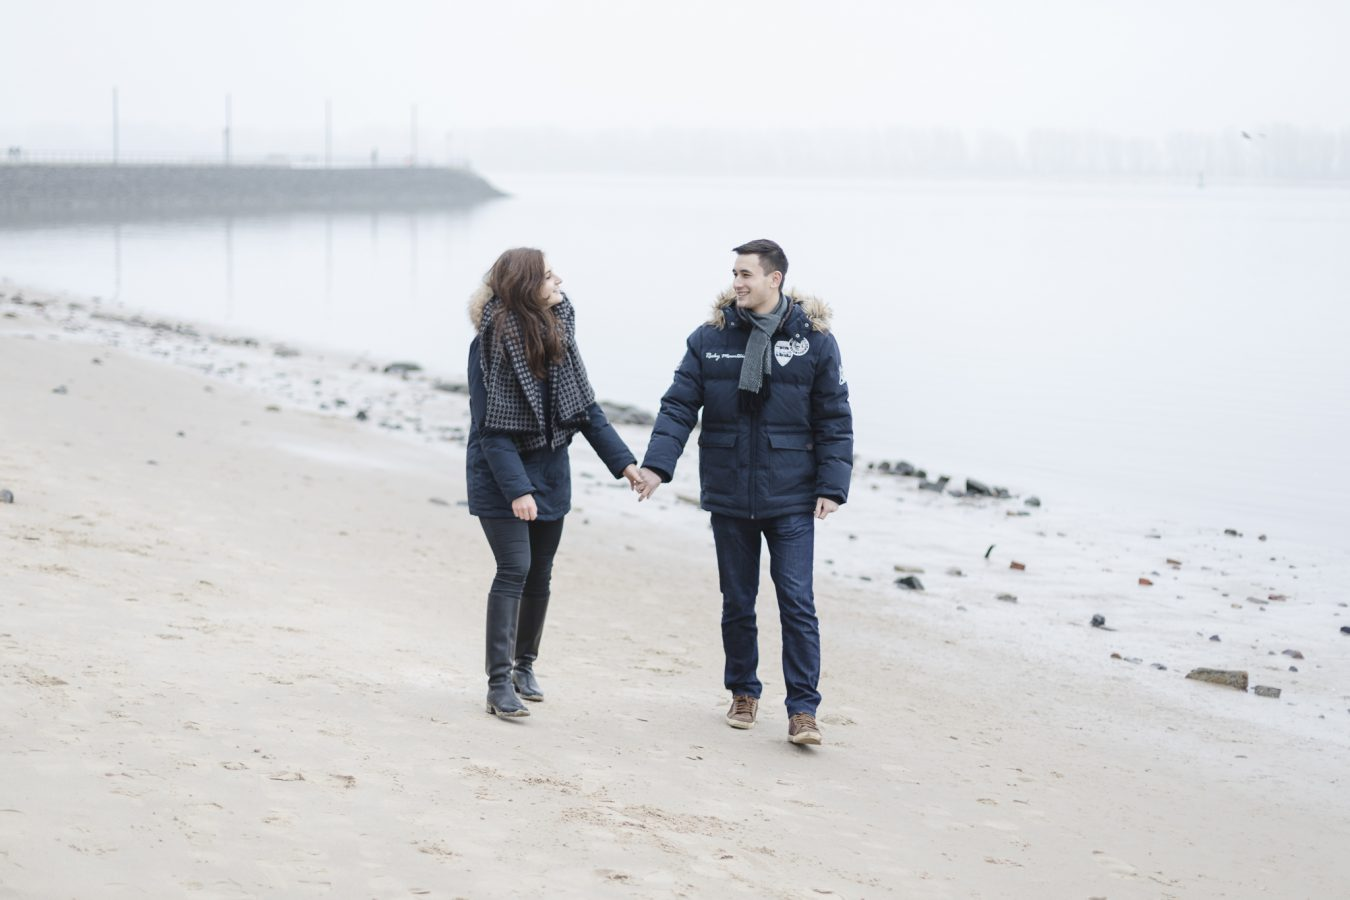 Paarshooting Hamburg - Paar in dicken Jacken geht gemeinsam am Strand entlang